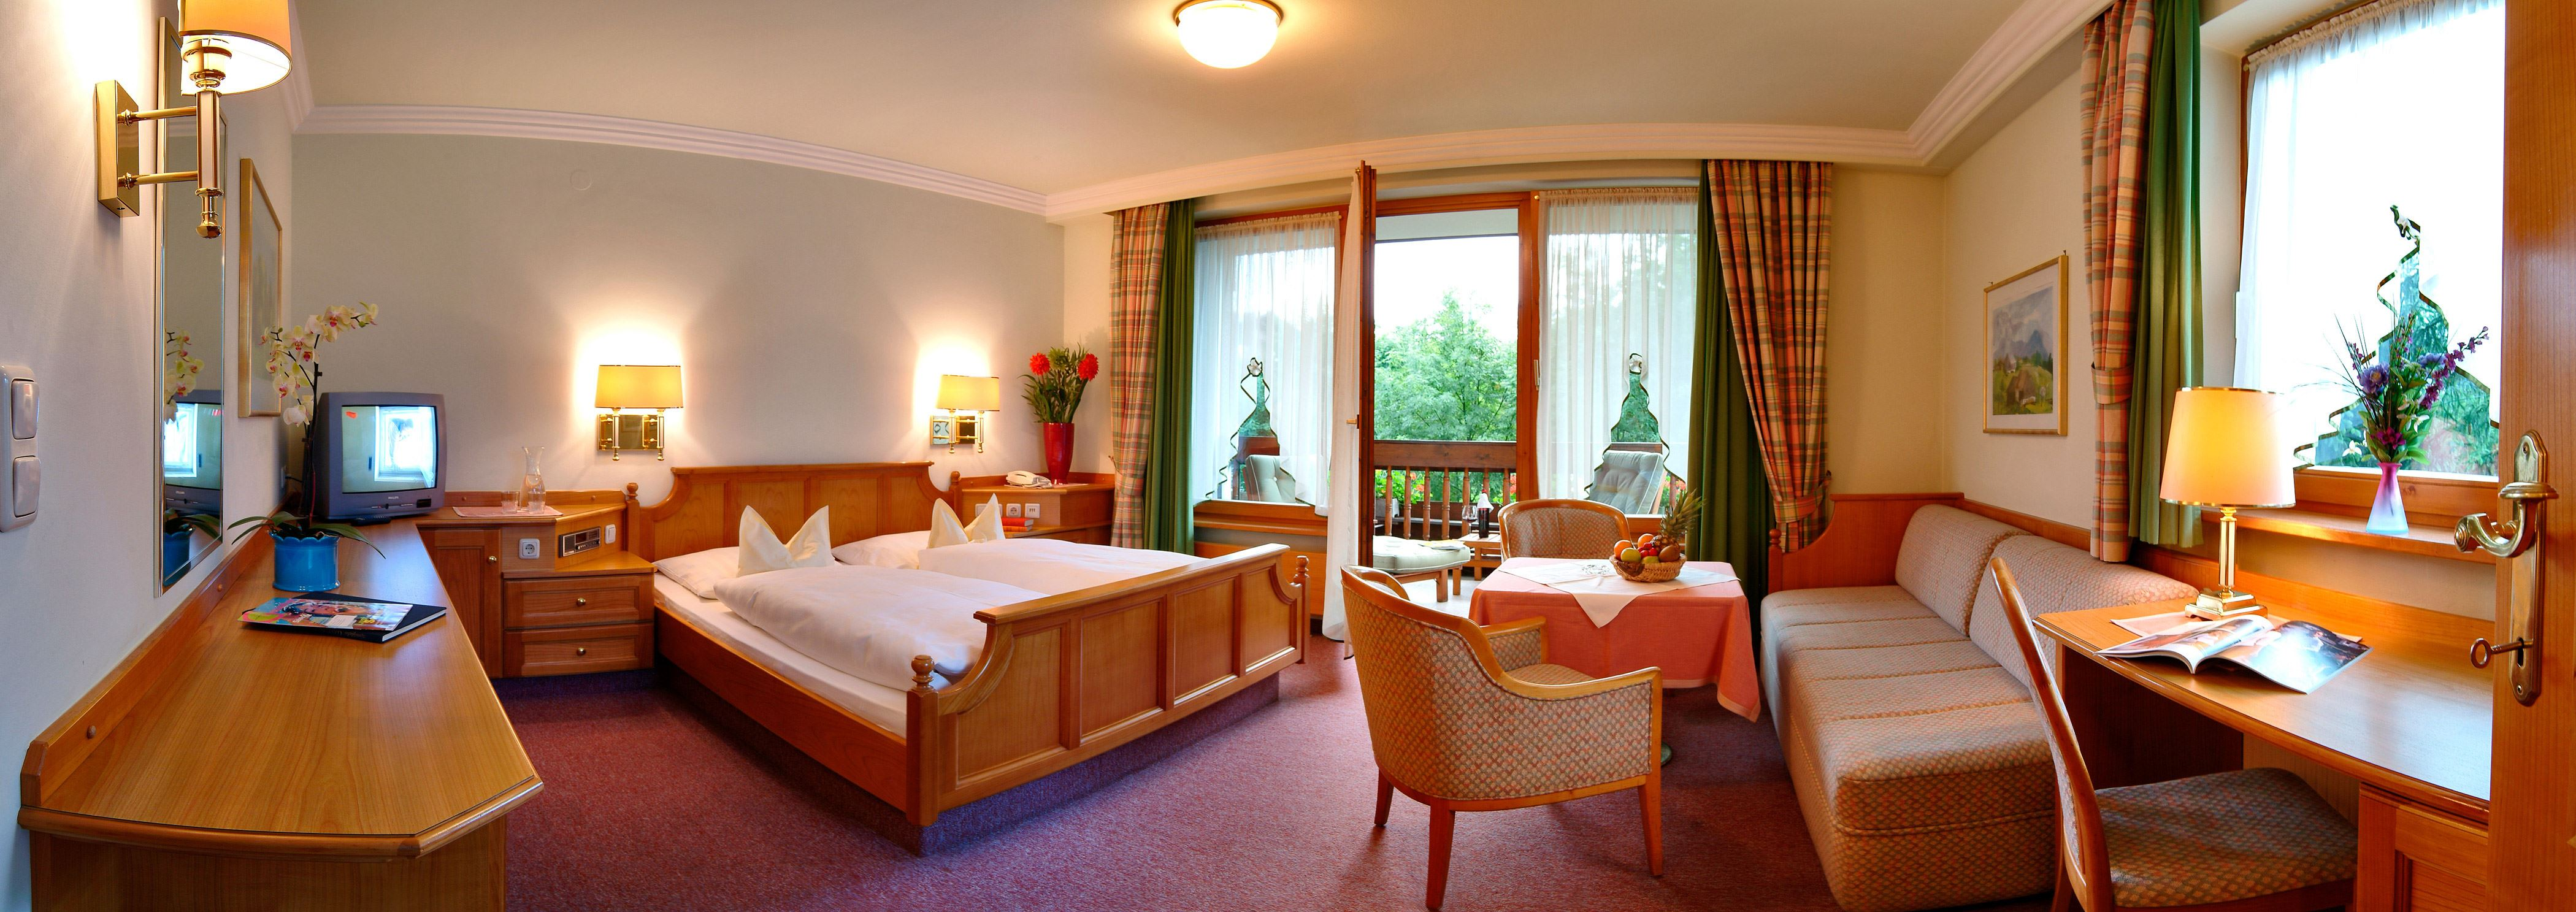 Impuls Hotel Tirol Bad Gastein